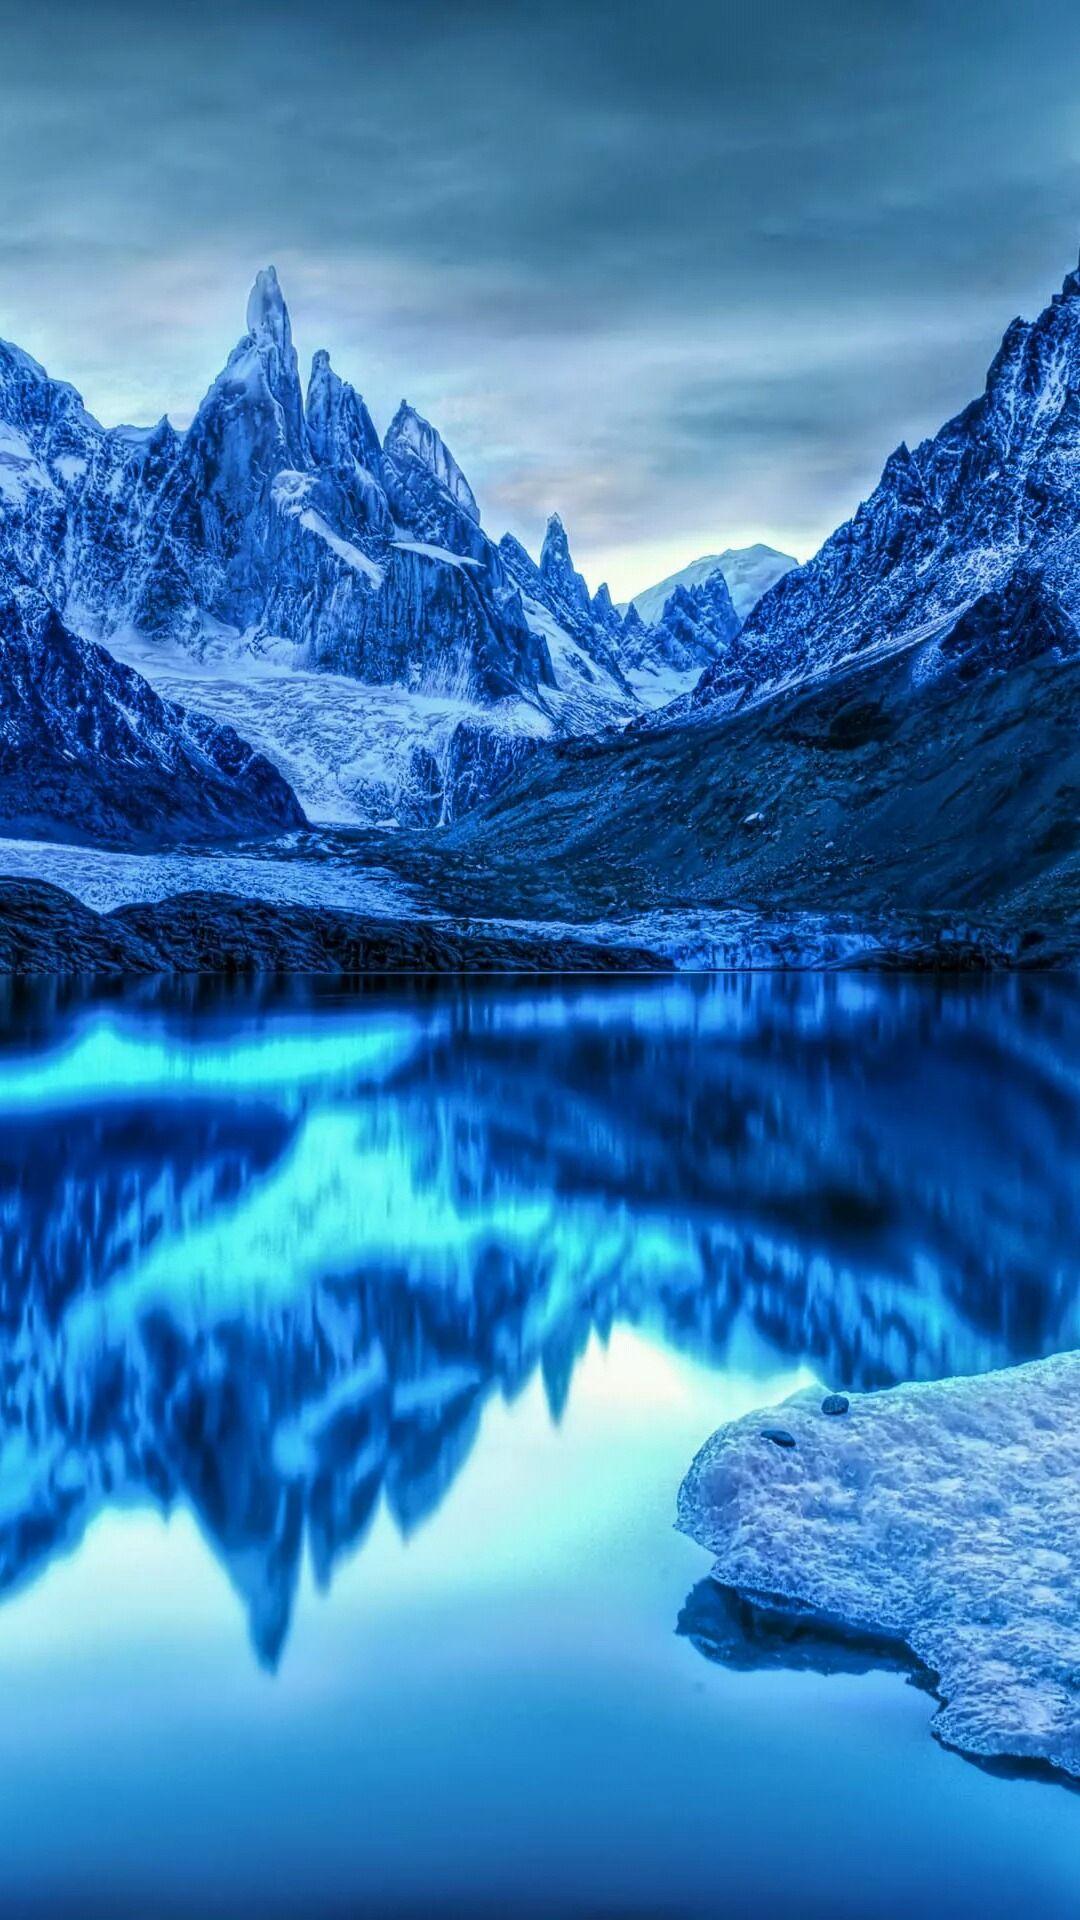 Ice Lake Iphone Wallpaper Landscape Landscape Scenery